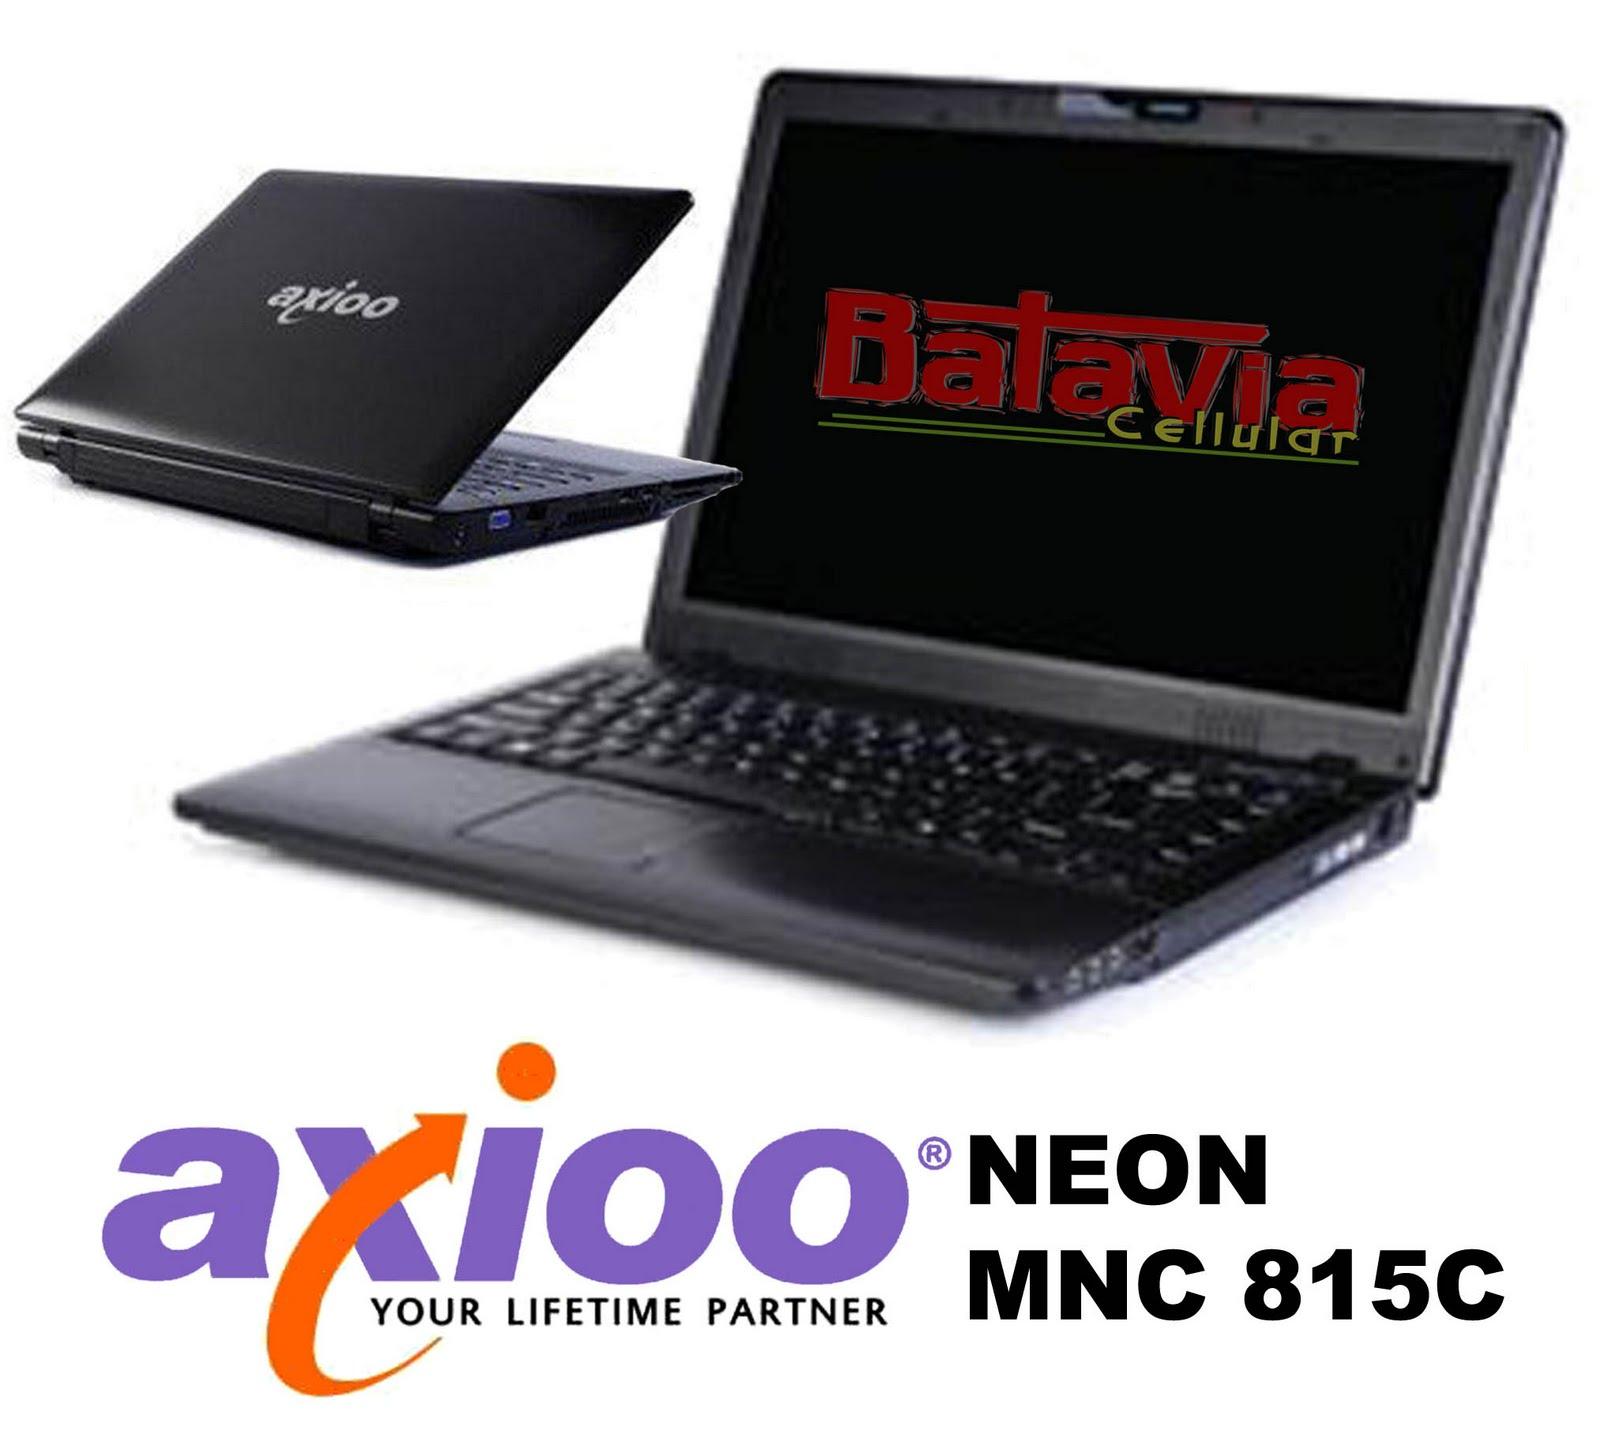 driver axioo neon mnc windows 7 32 bit